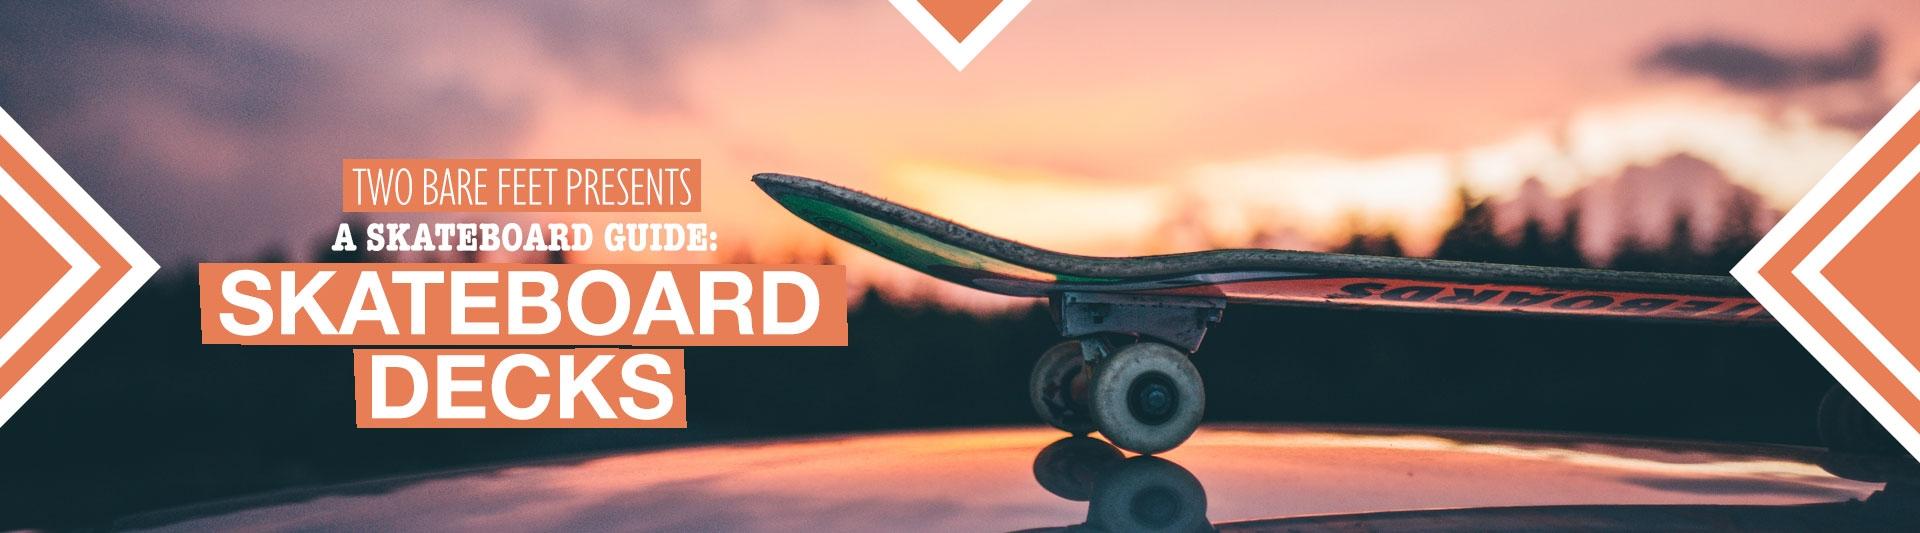 Skateboard decks banner